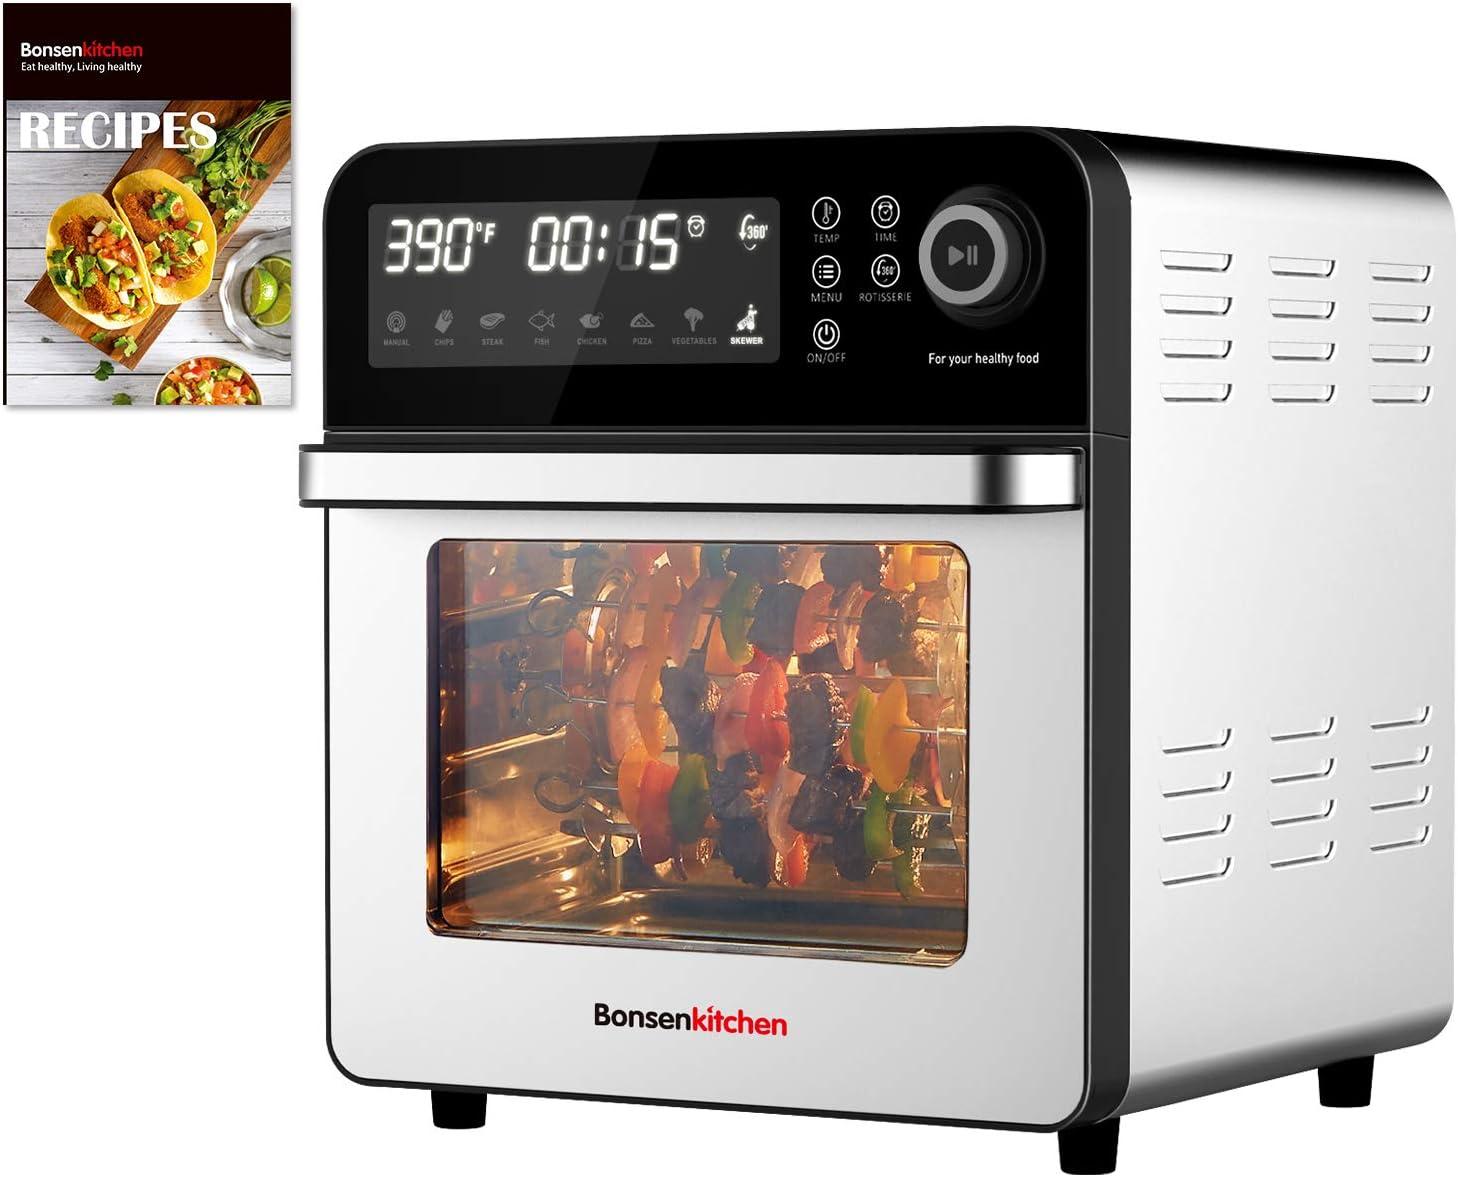 Air Fryer Toaster Kansas City Mall Sacramento Mall Oven 1600W Bons 15.3QT 8-IN-1